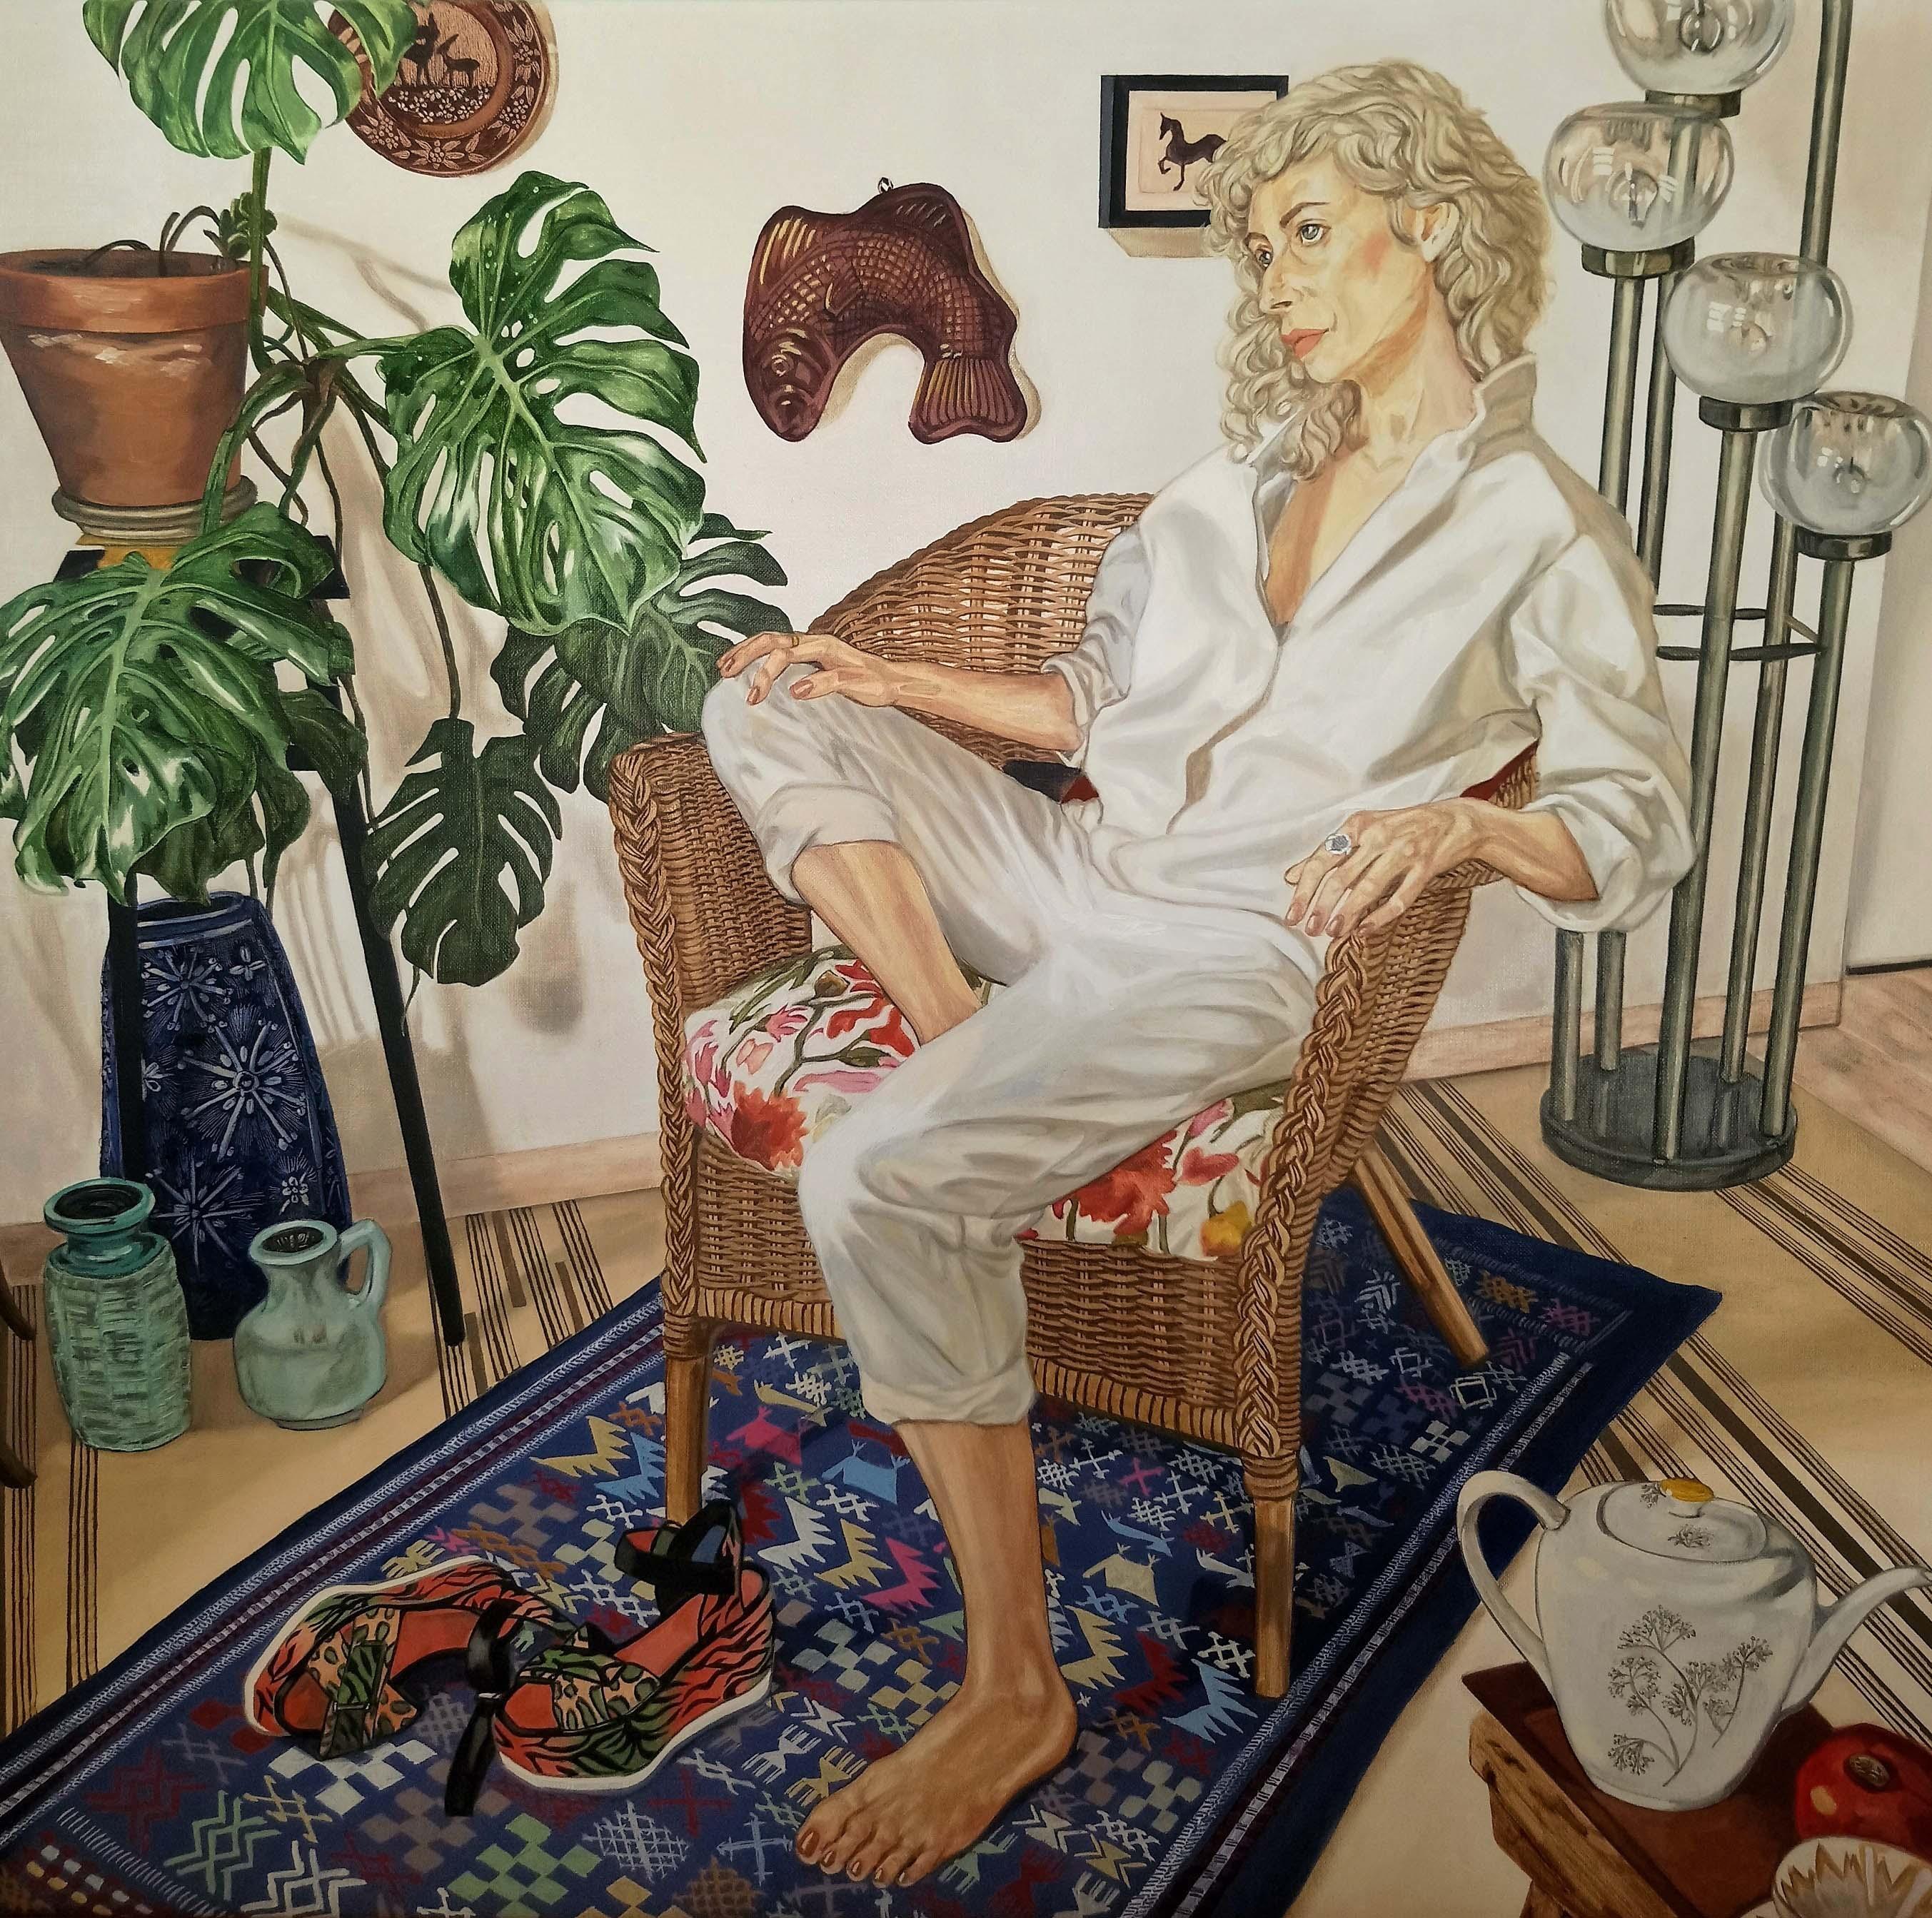 """A Portrait of Sonia"" (2020), huile sur lin, 100 x 100 cm. Courtesy of the artist."